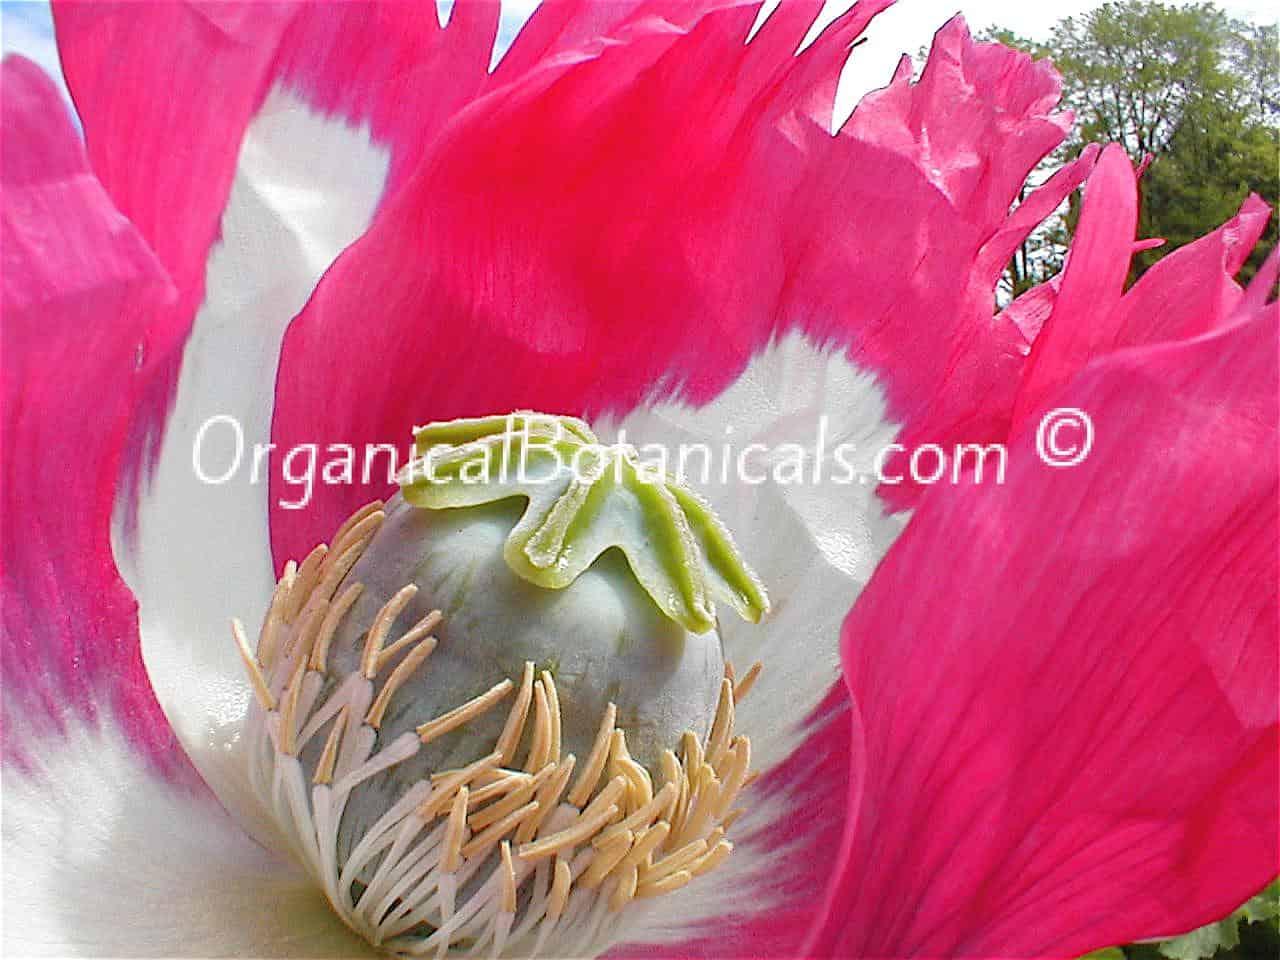 Afghan GMO Super Opium Poppy Pod comparison